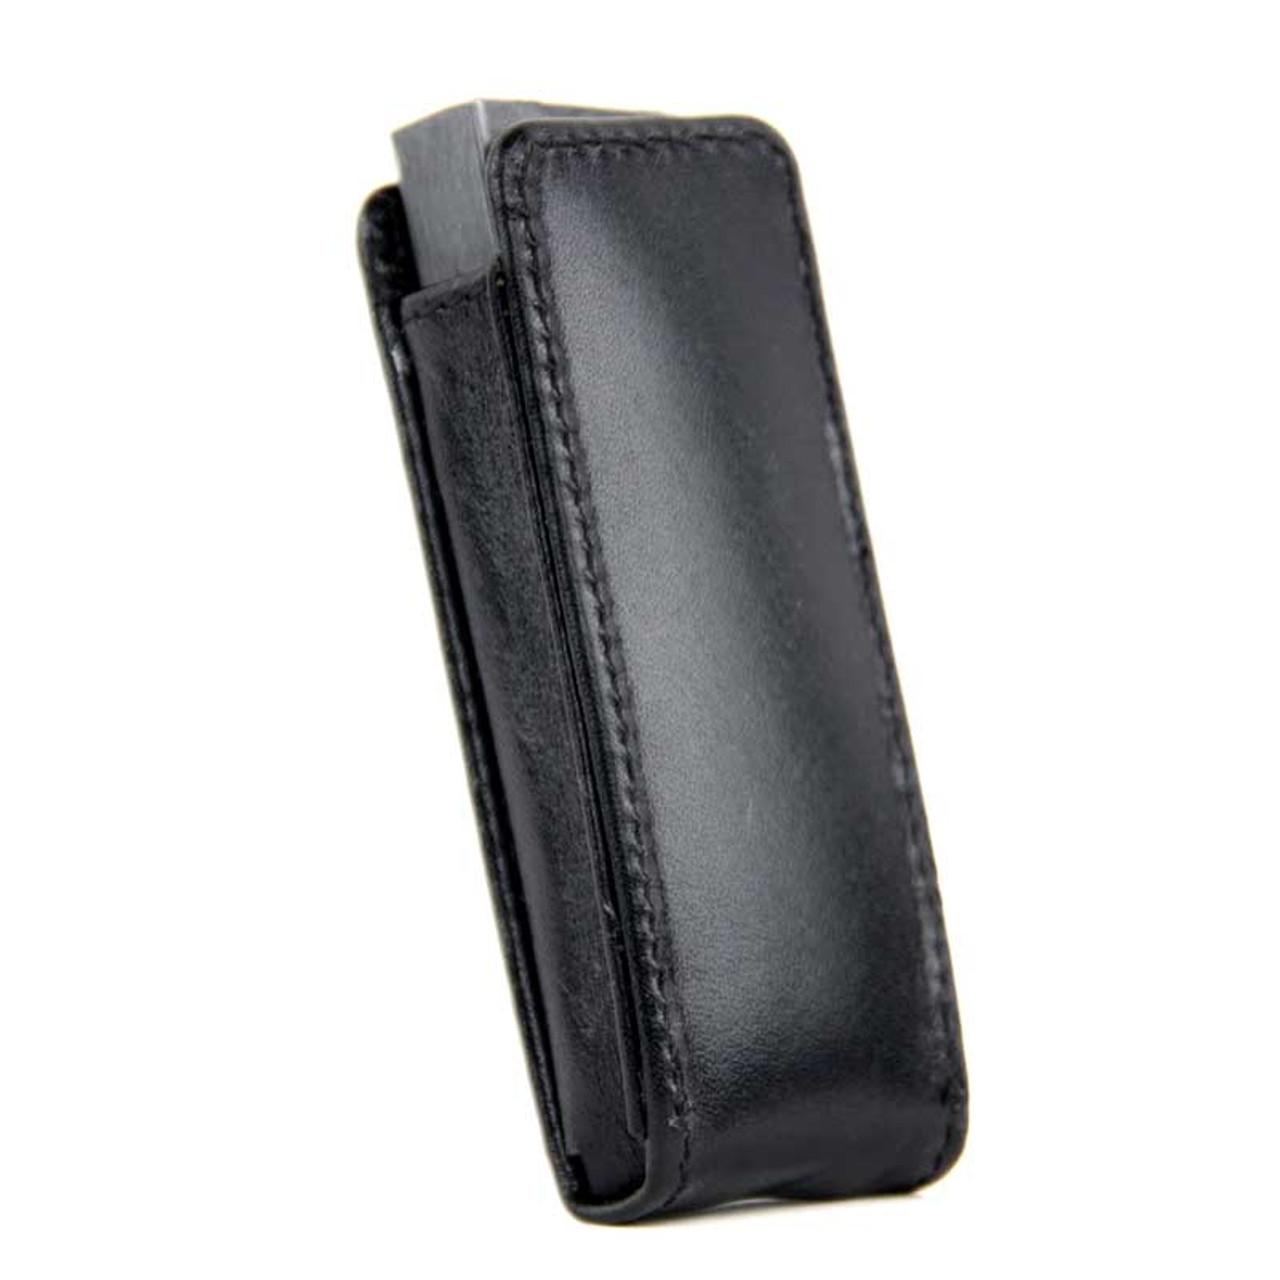 Kahr MK9 Magazine Pocket Protector